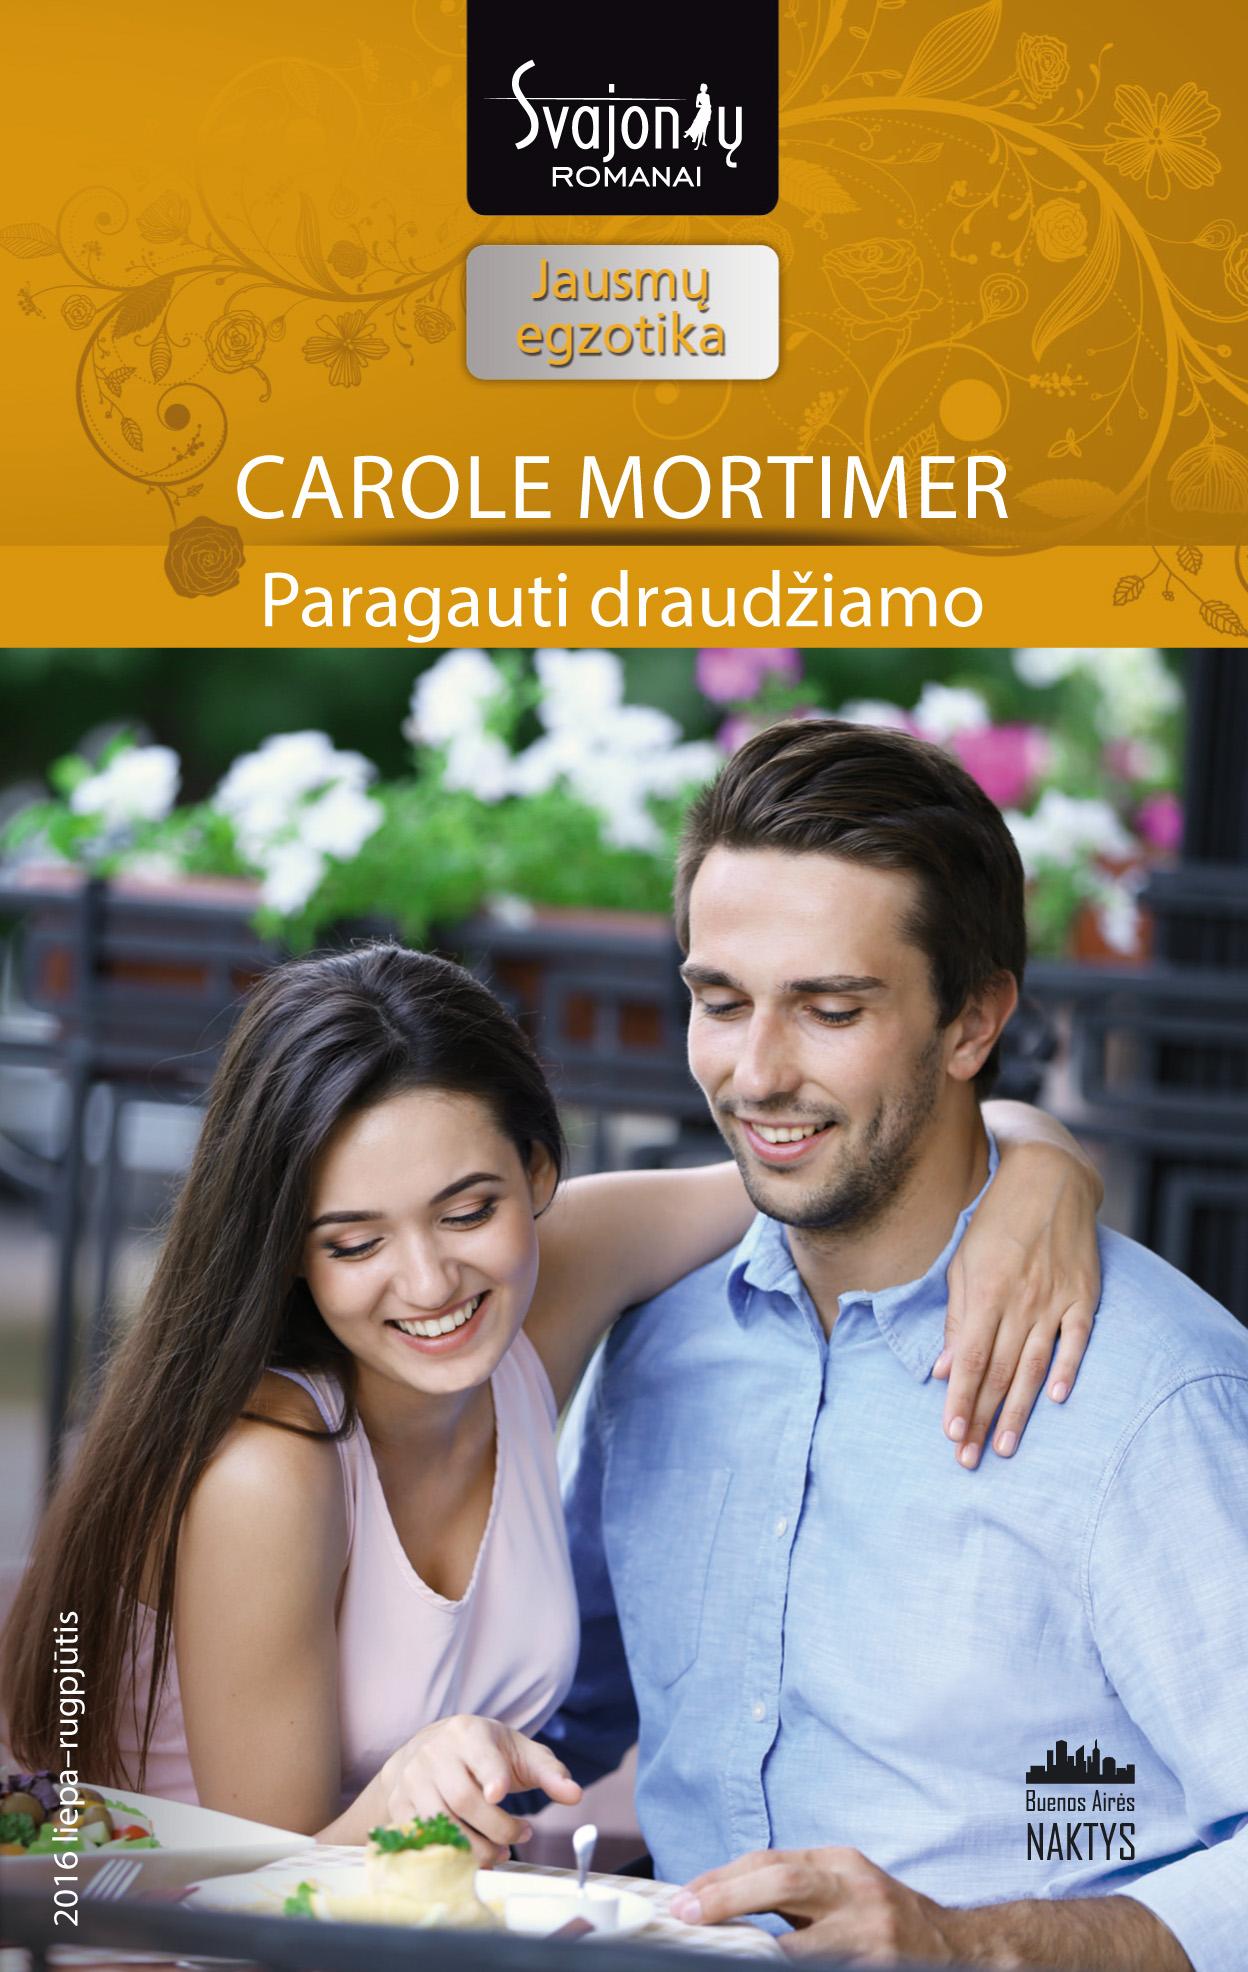 лучшая цена Кэрол Мортимер Paragauti draudžiamo